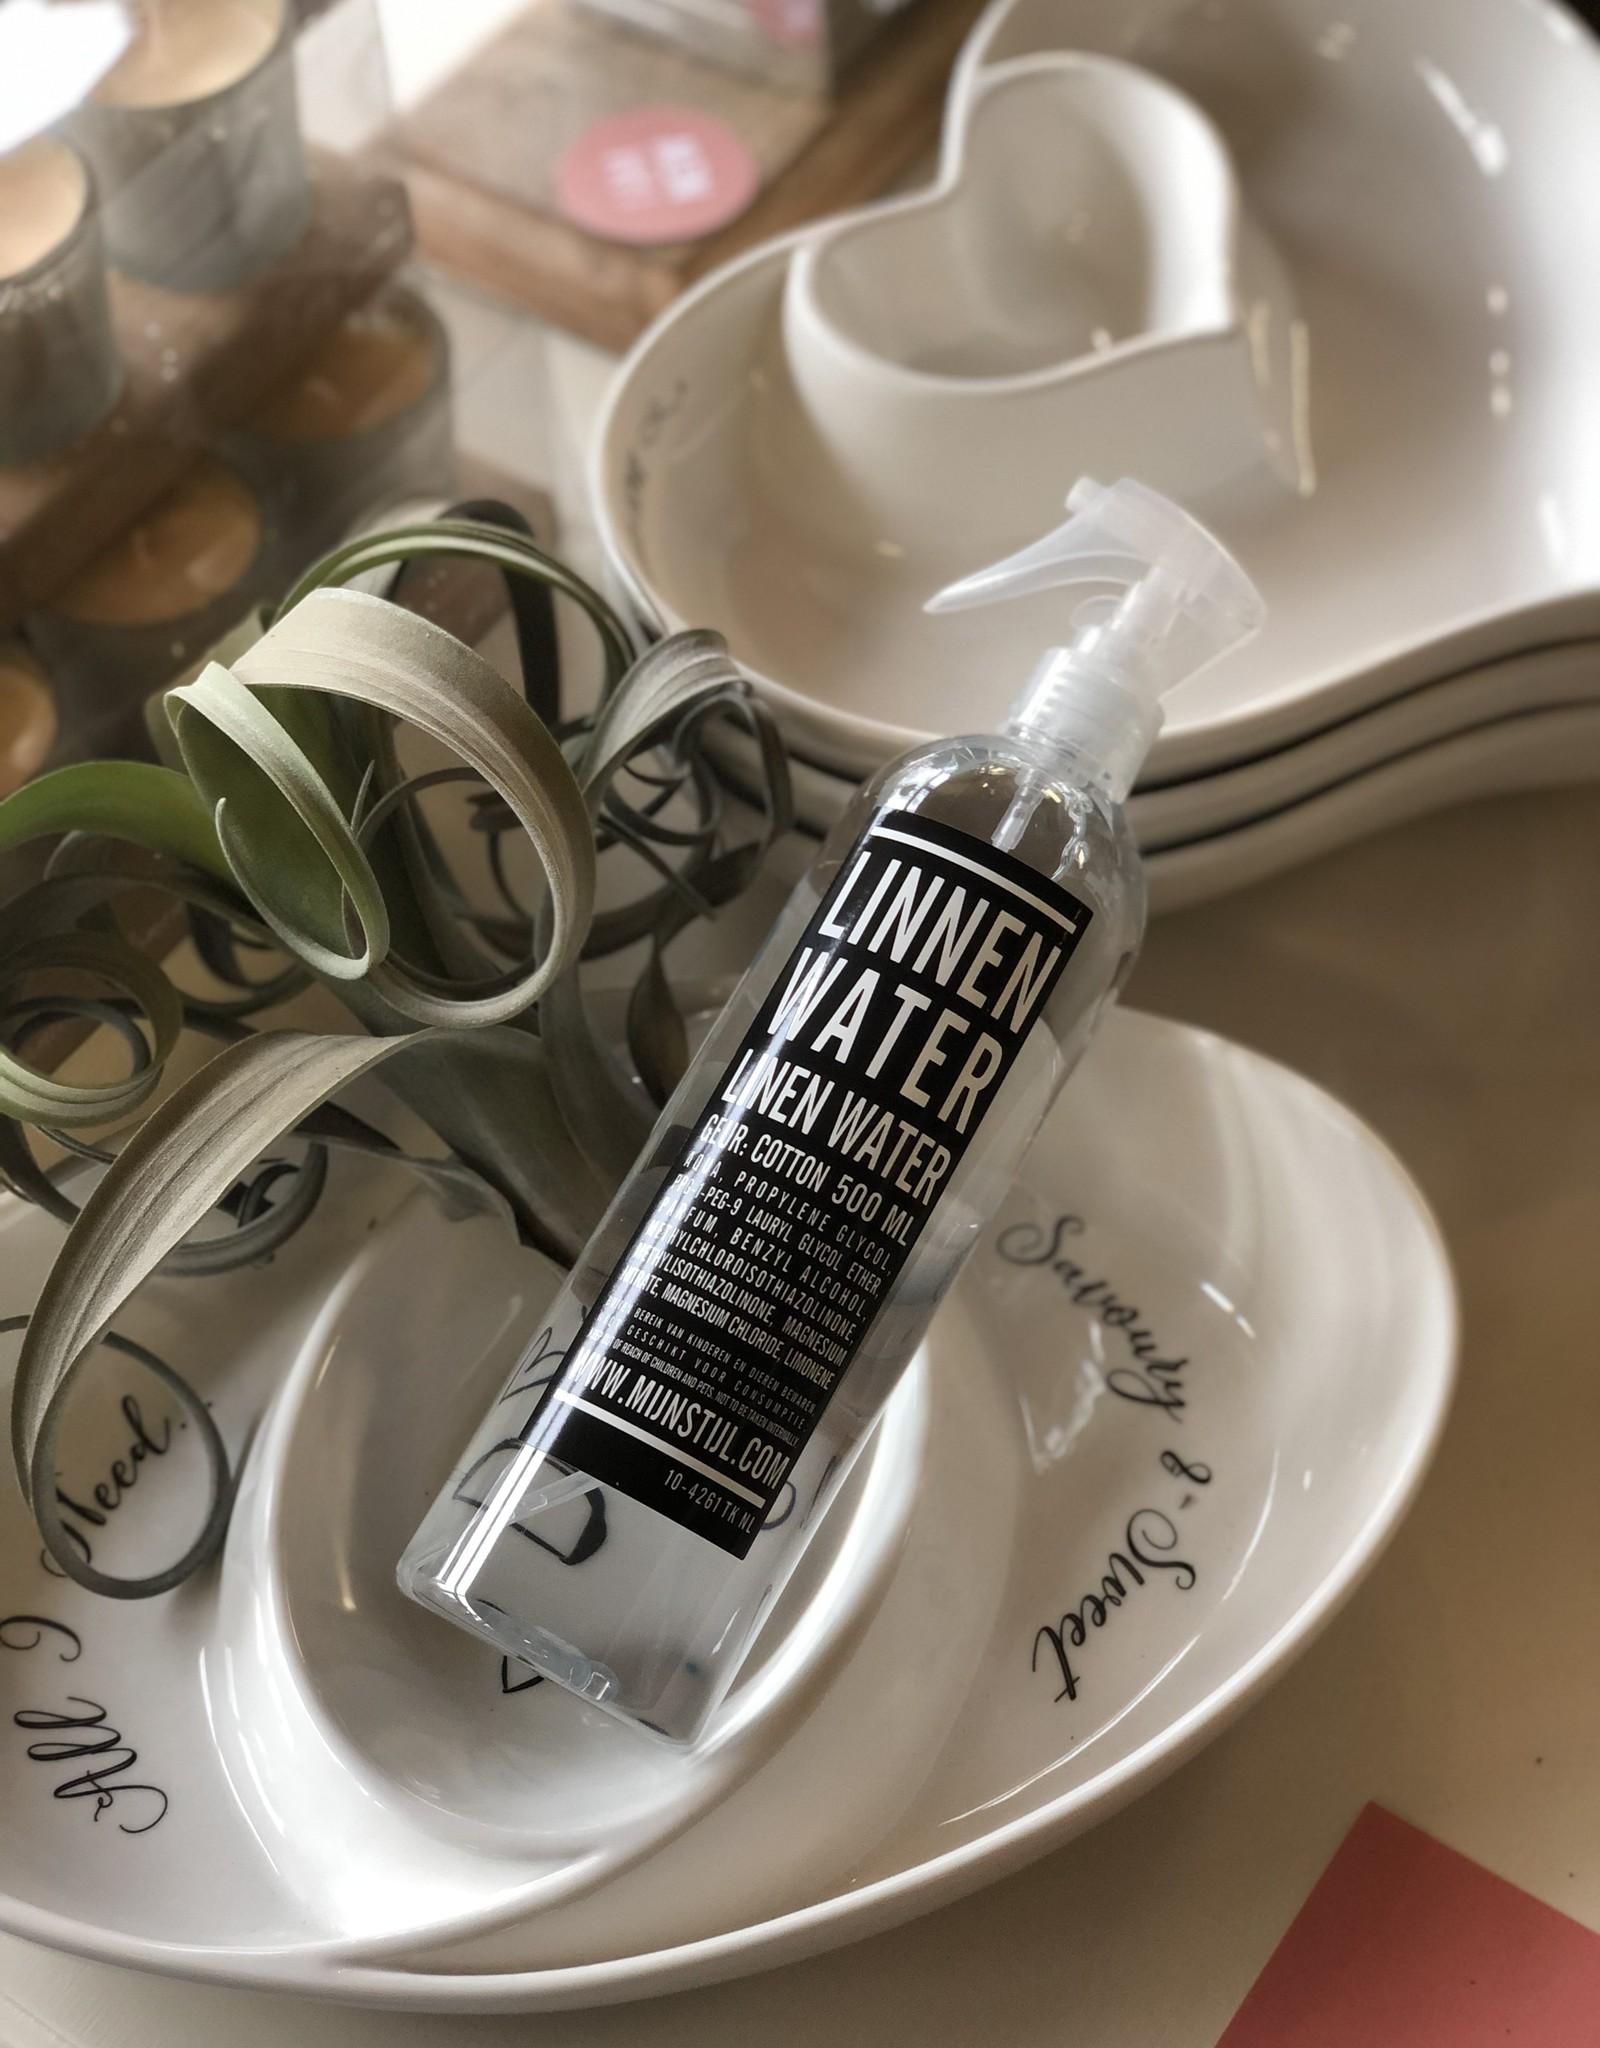 Mijn stijl Linnenwater Parfum linnen